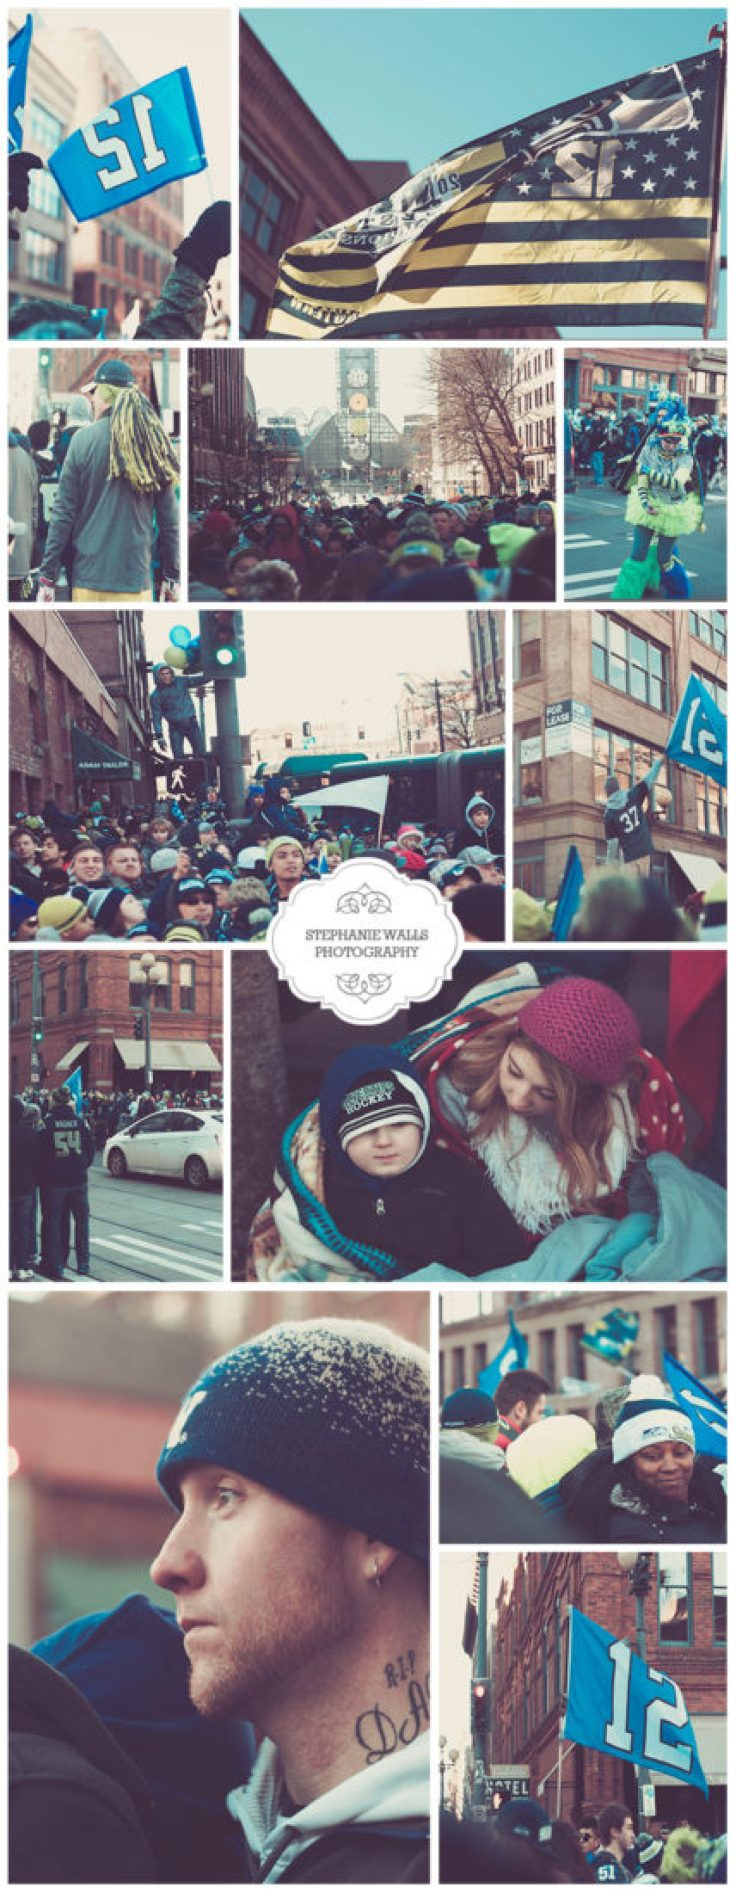 Seahawks blog 700,000 SEAHAWK PARADE|SEATTLE PHOTOGRAPHER